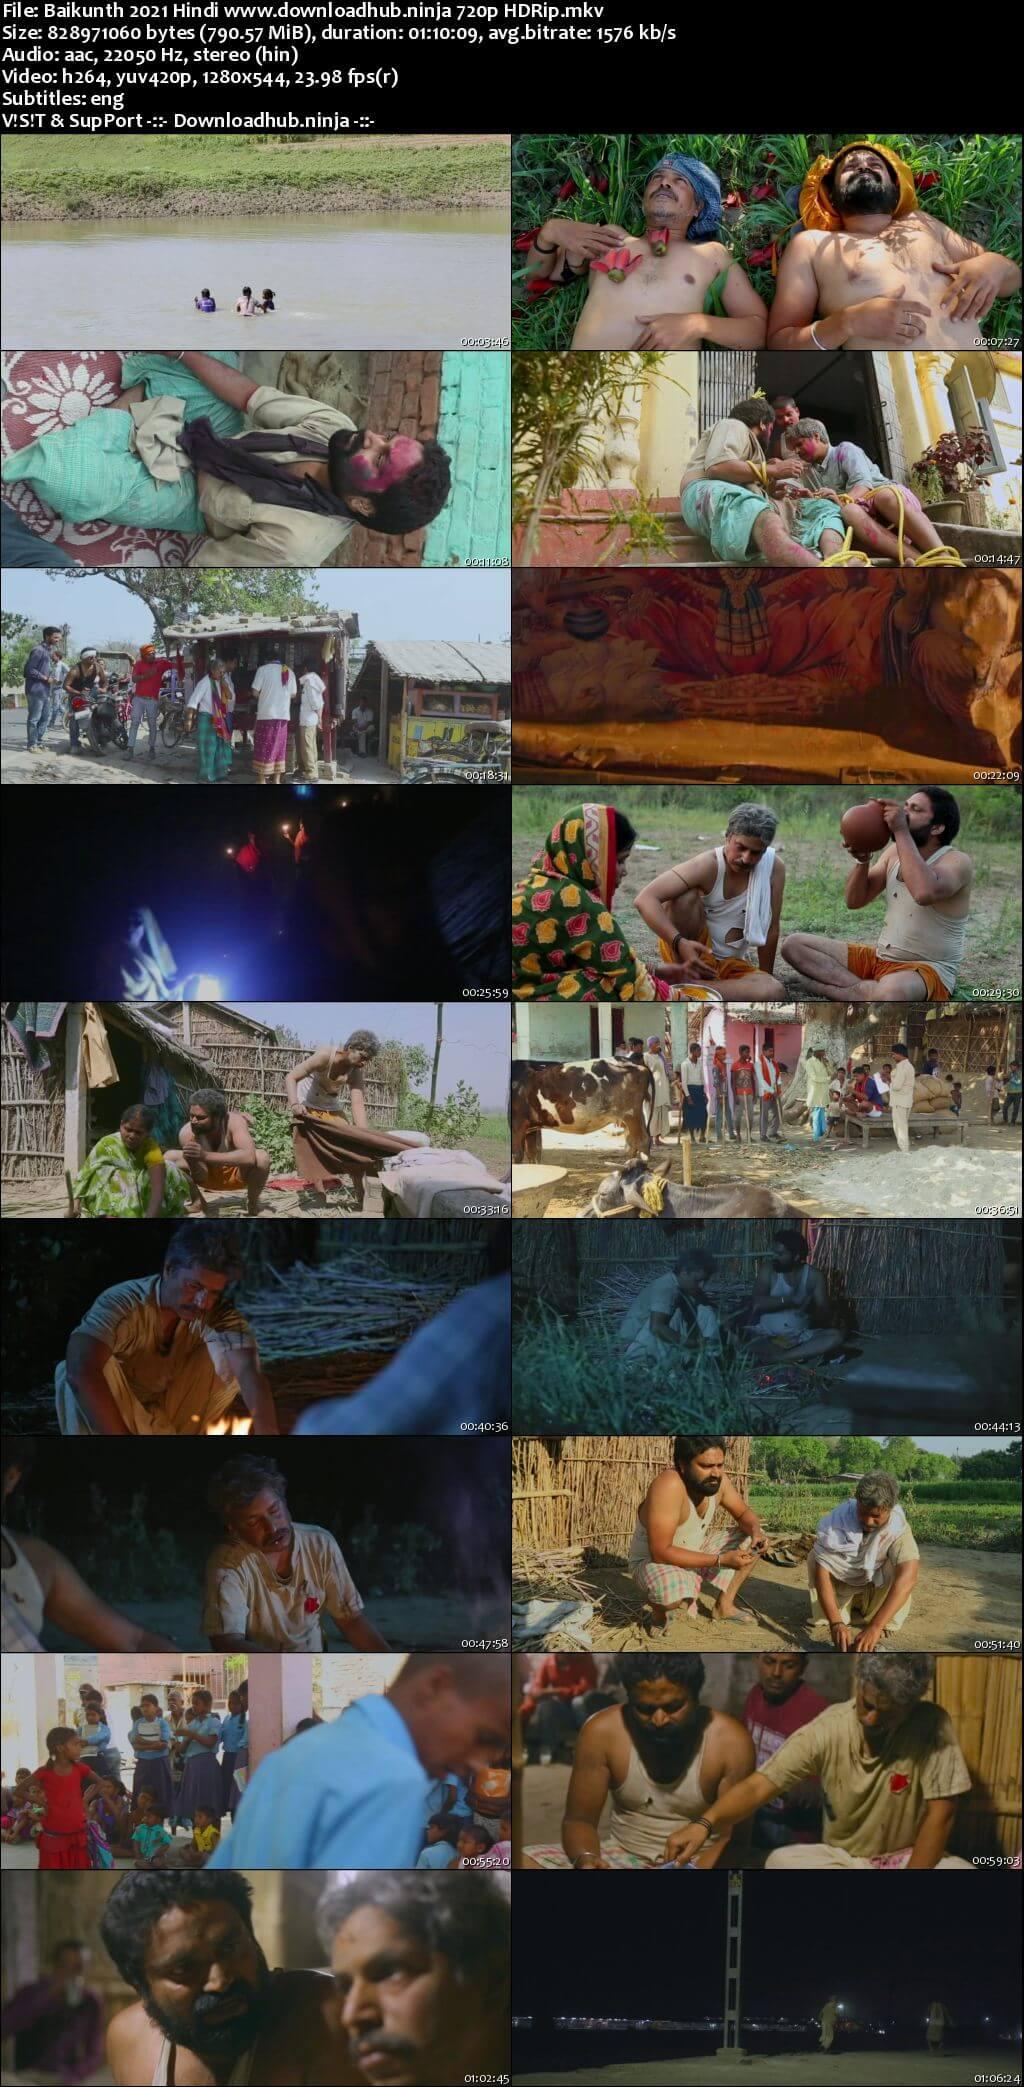 Baikunth 2021 Hindi 720p HDRip ESubs